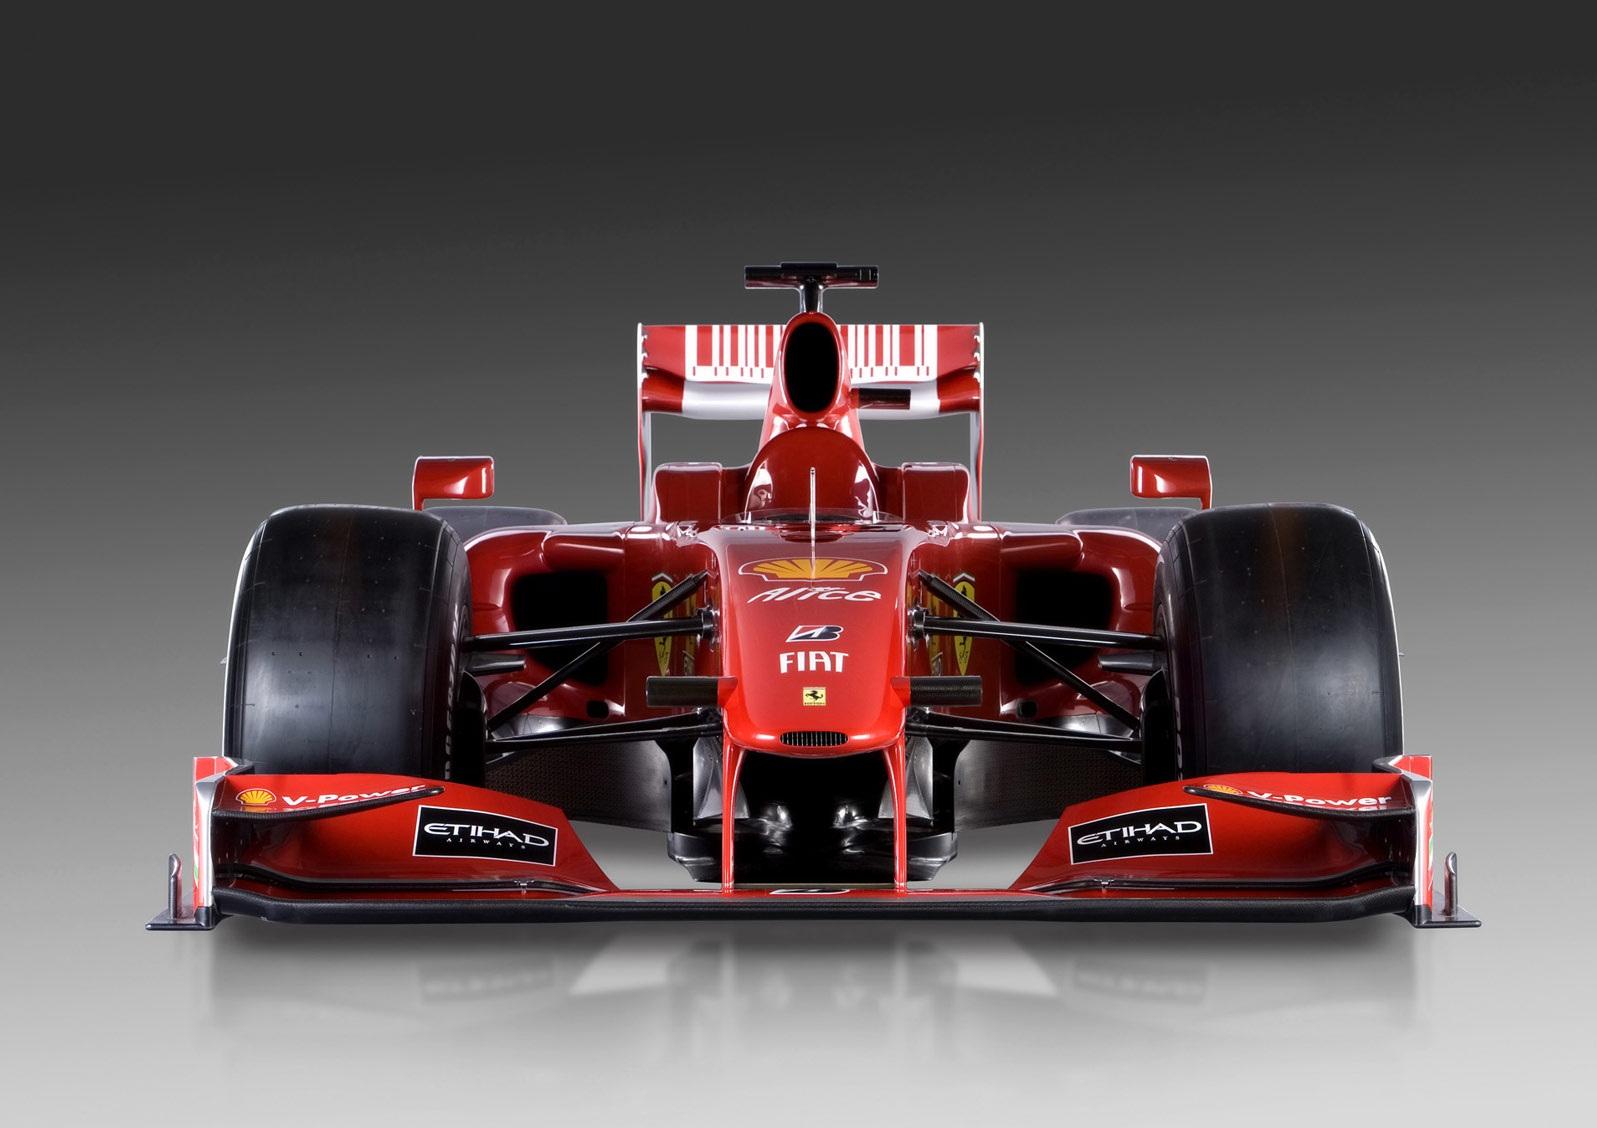 http://3.bp.blogspot.com/-6yYNVyCkxIo/TcaVs805z9I/AAAAAAAAAPM/1JmVijlVBkU/s1600/Ferrari_F1-60_343_1600x1200.jpg